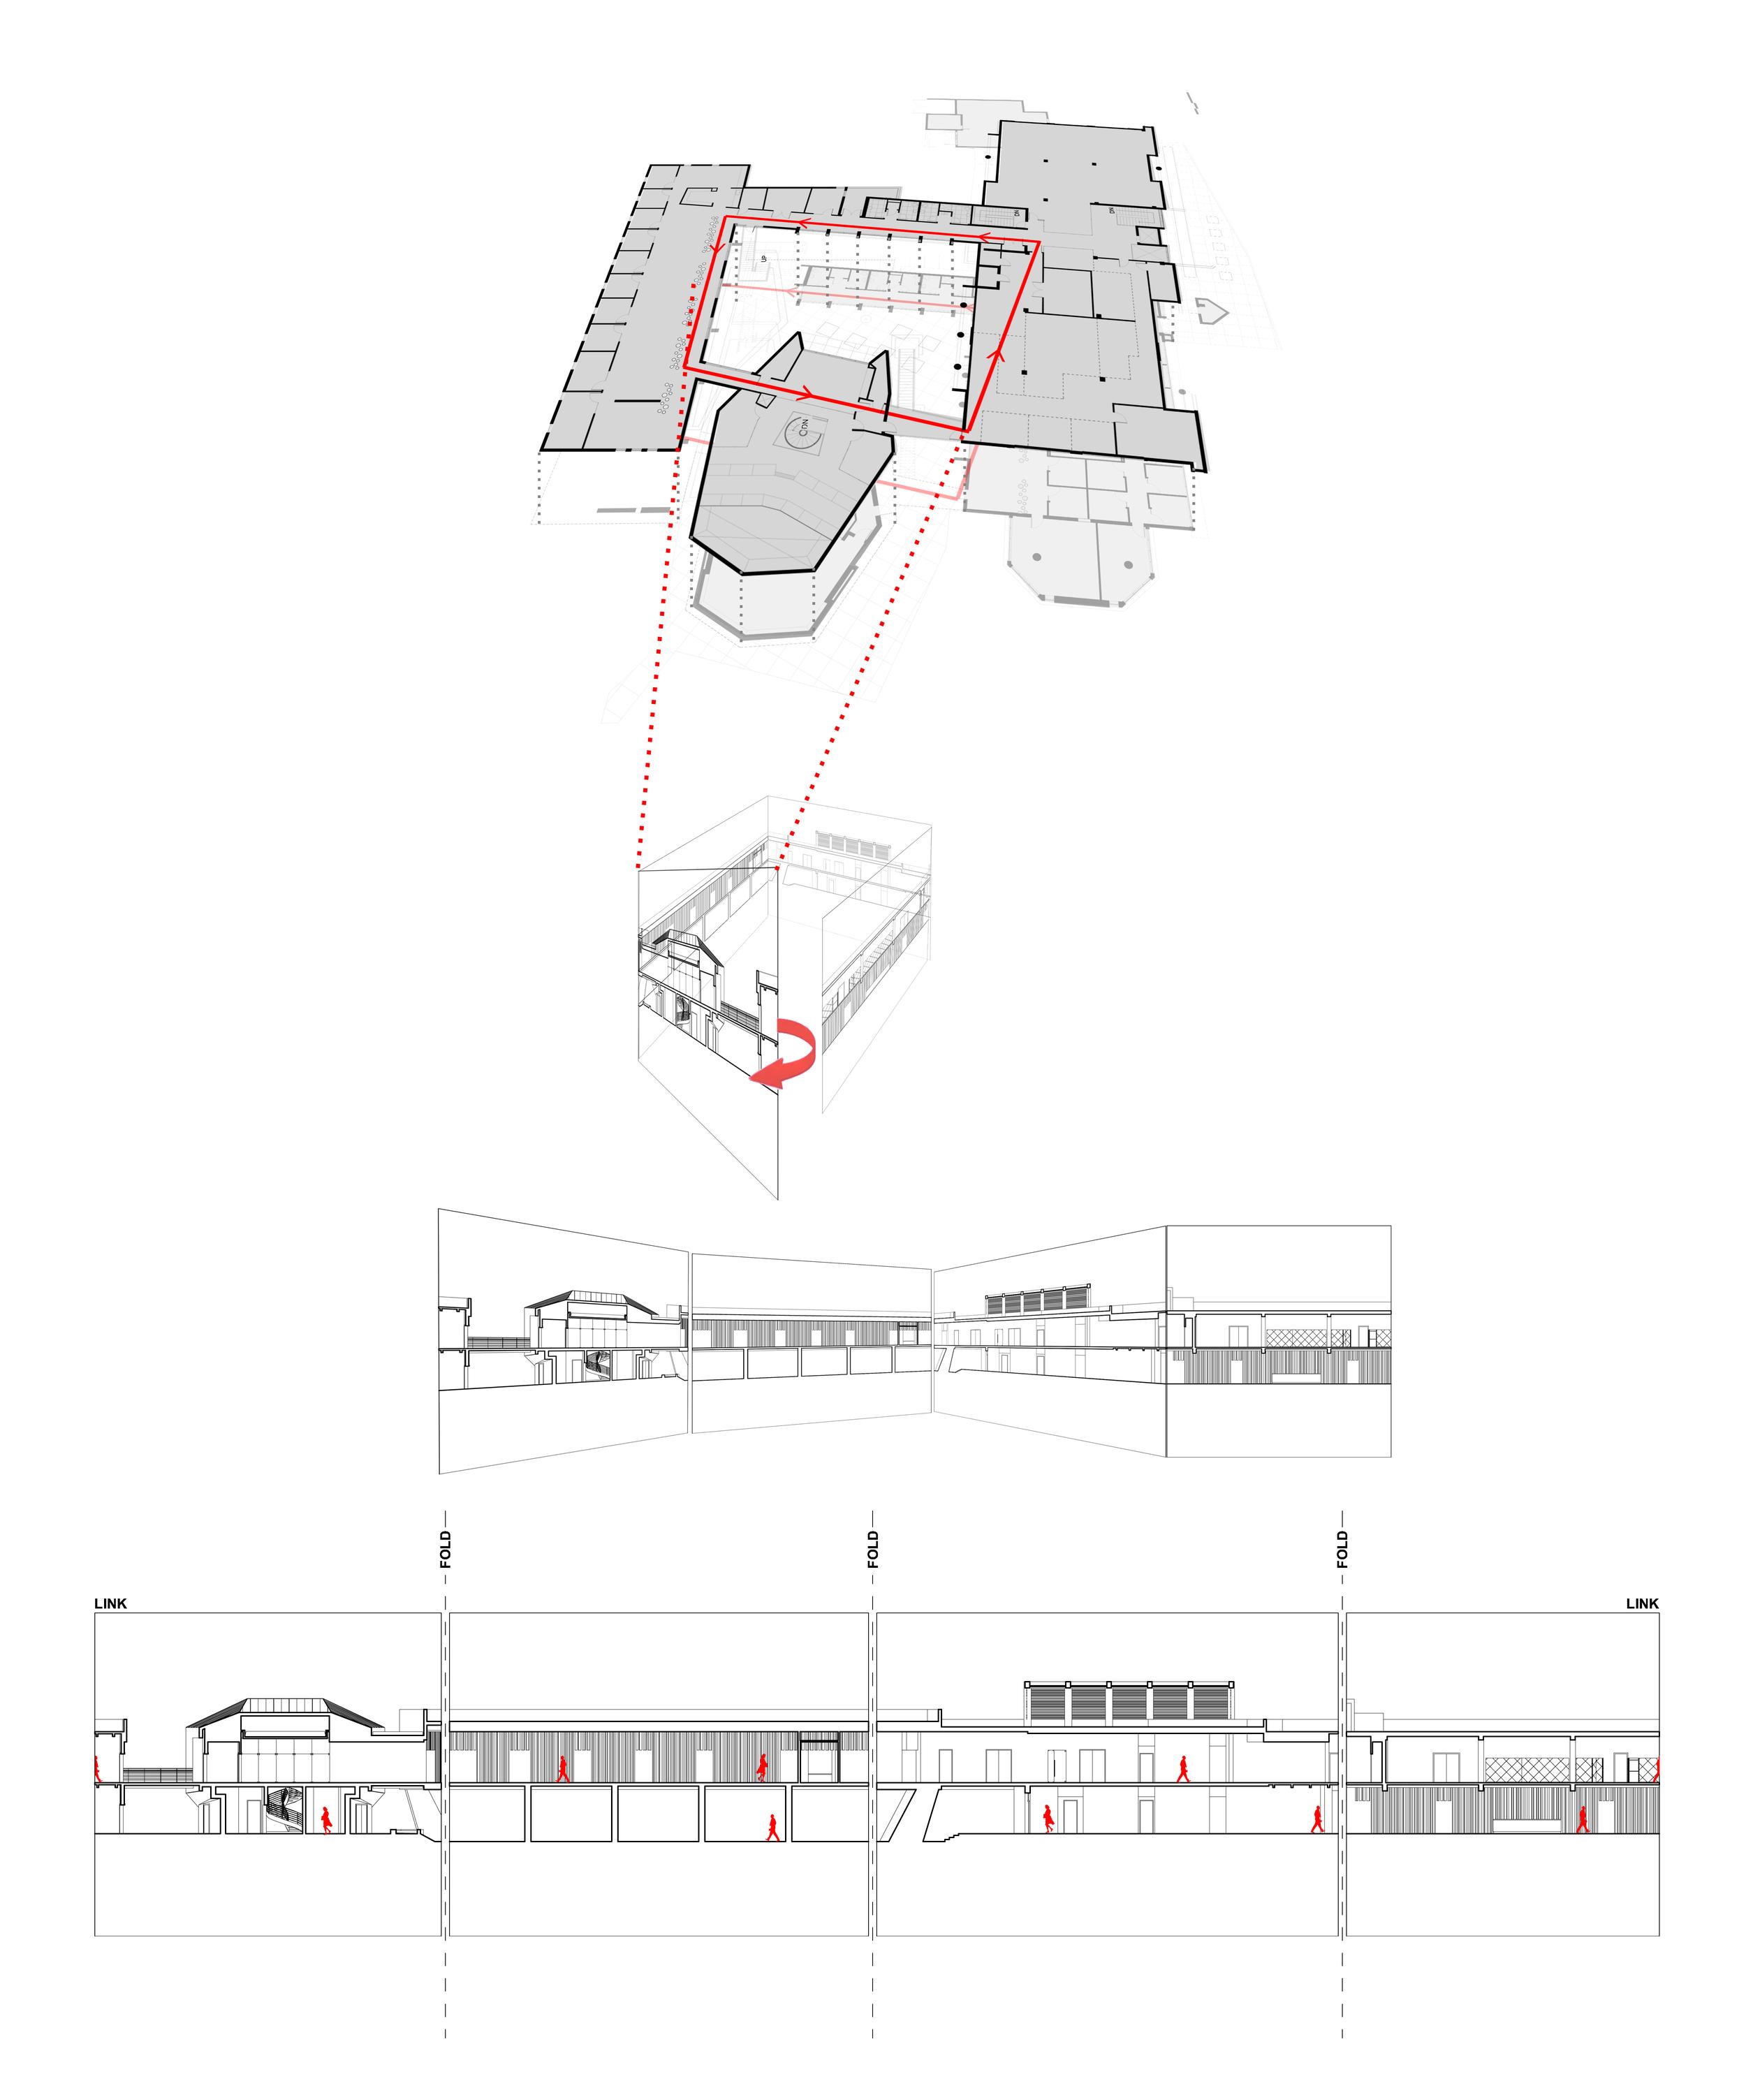 10_DIAGRAM interior elevation.jpg